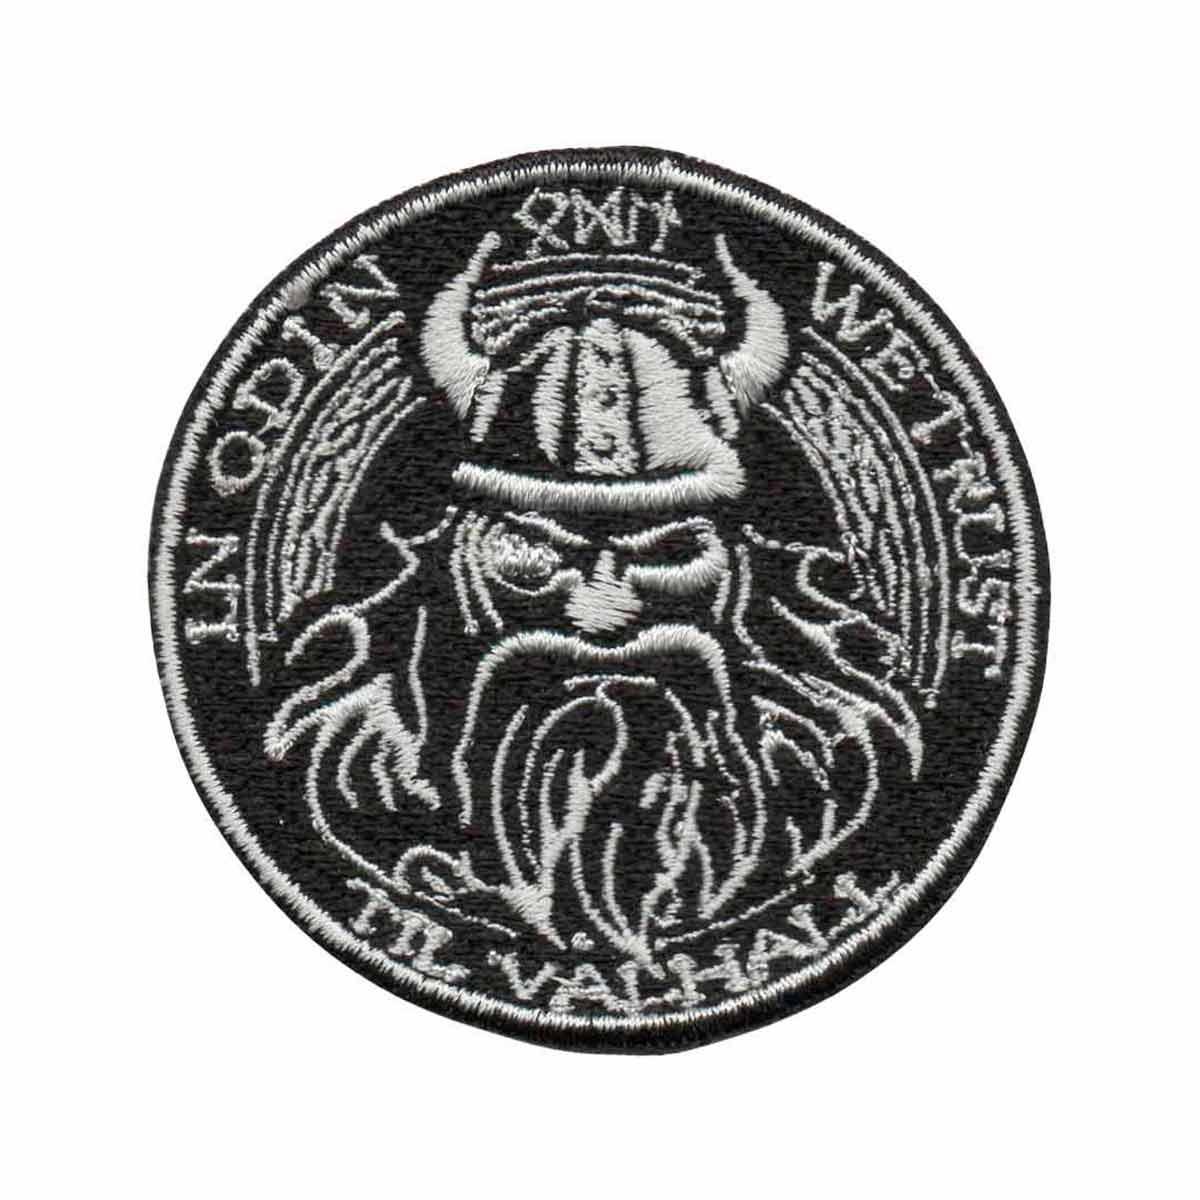 Patch Bordado - Deus Nórdico Guerra Viking Odin DV80804-48  - Talysmã Bordados